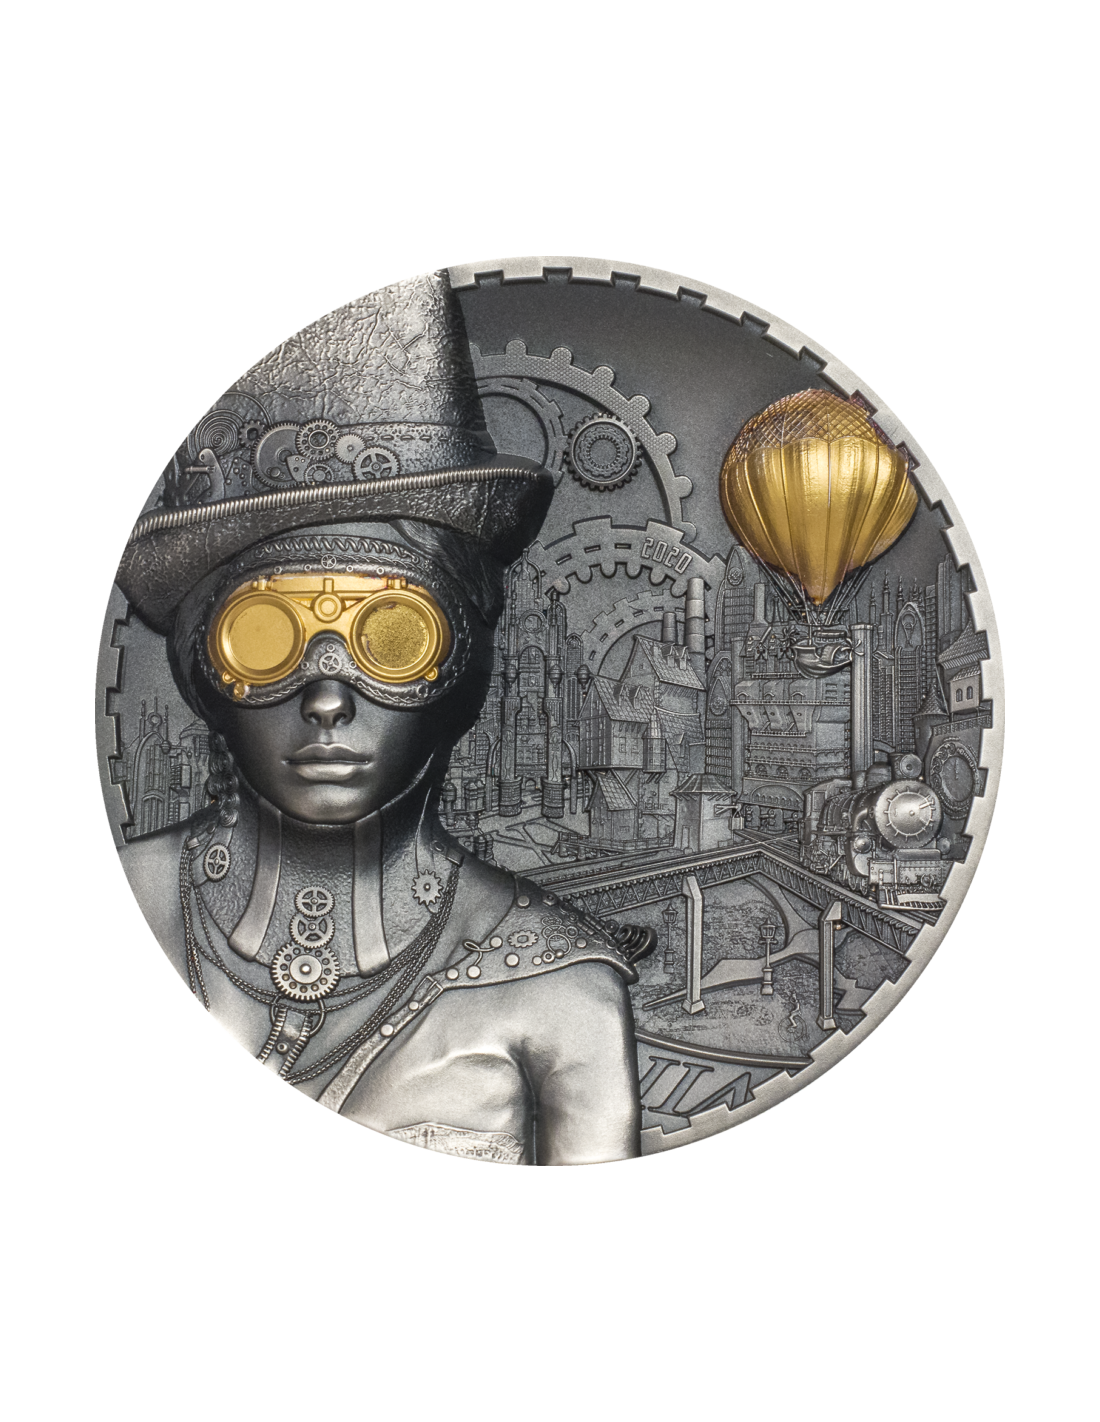 Steampunk 3 Oz Silver Coin 20 Cook Islands 2020